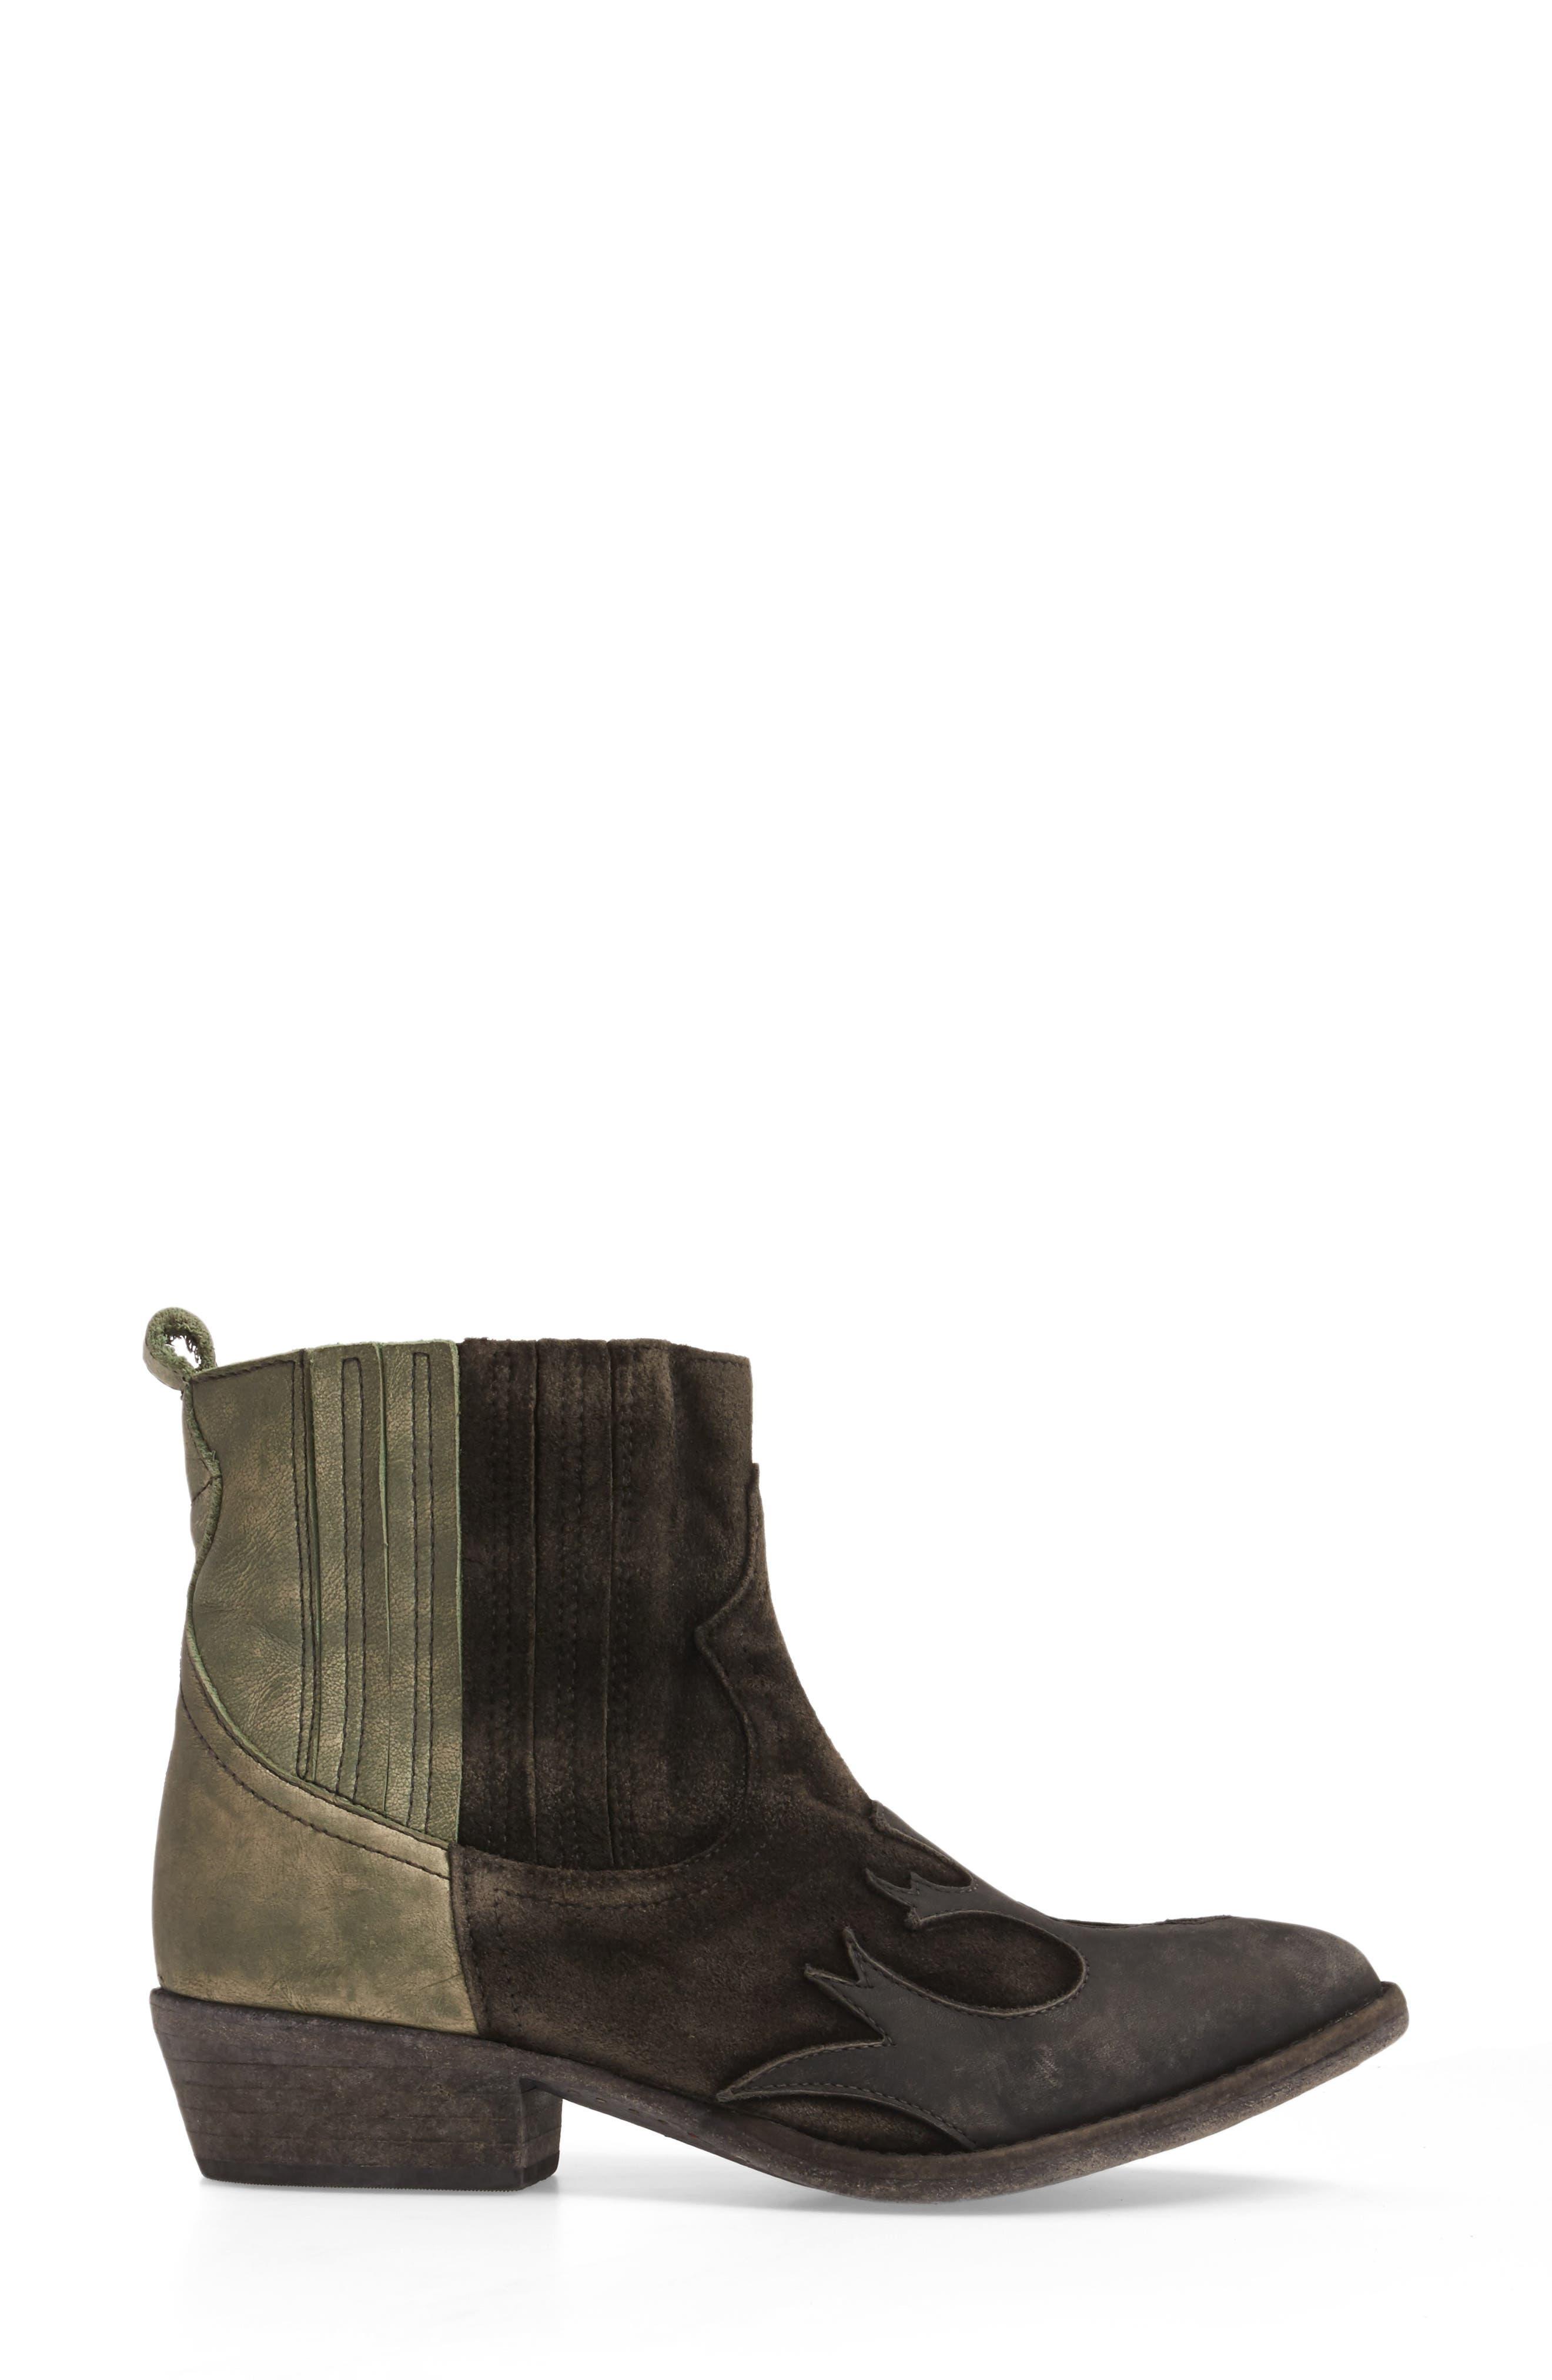 Royston Bootie,                             Alternate thumbnail 3, color,                             Black Leather